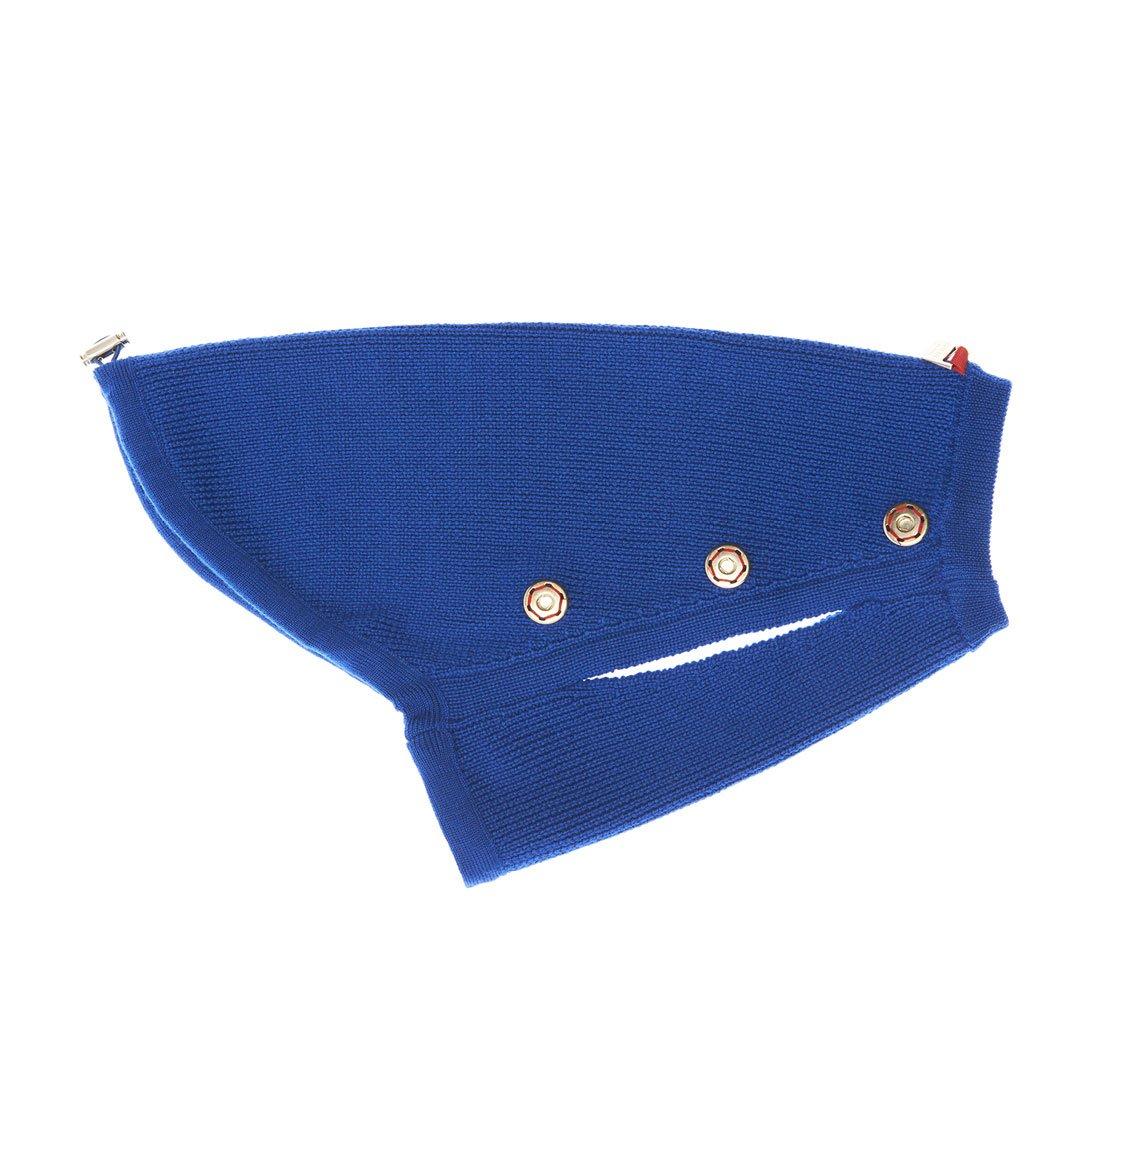 Poldo Dog Couture Cortina Blue 2 in 1 Luxury Dog Coat Small-30cm | Small-35cm | Medium-40cm